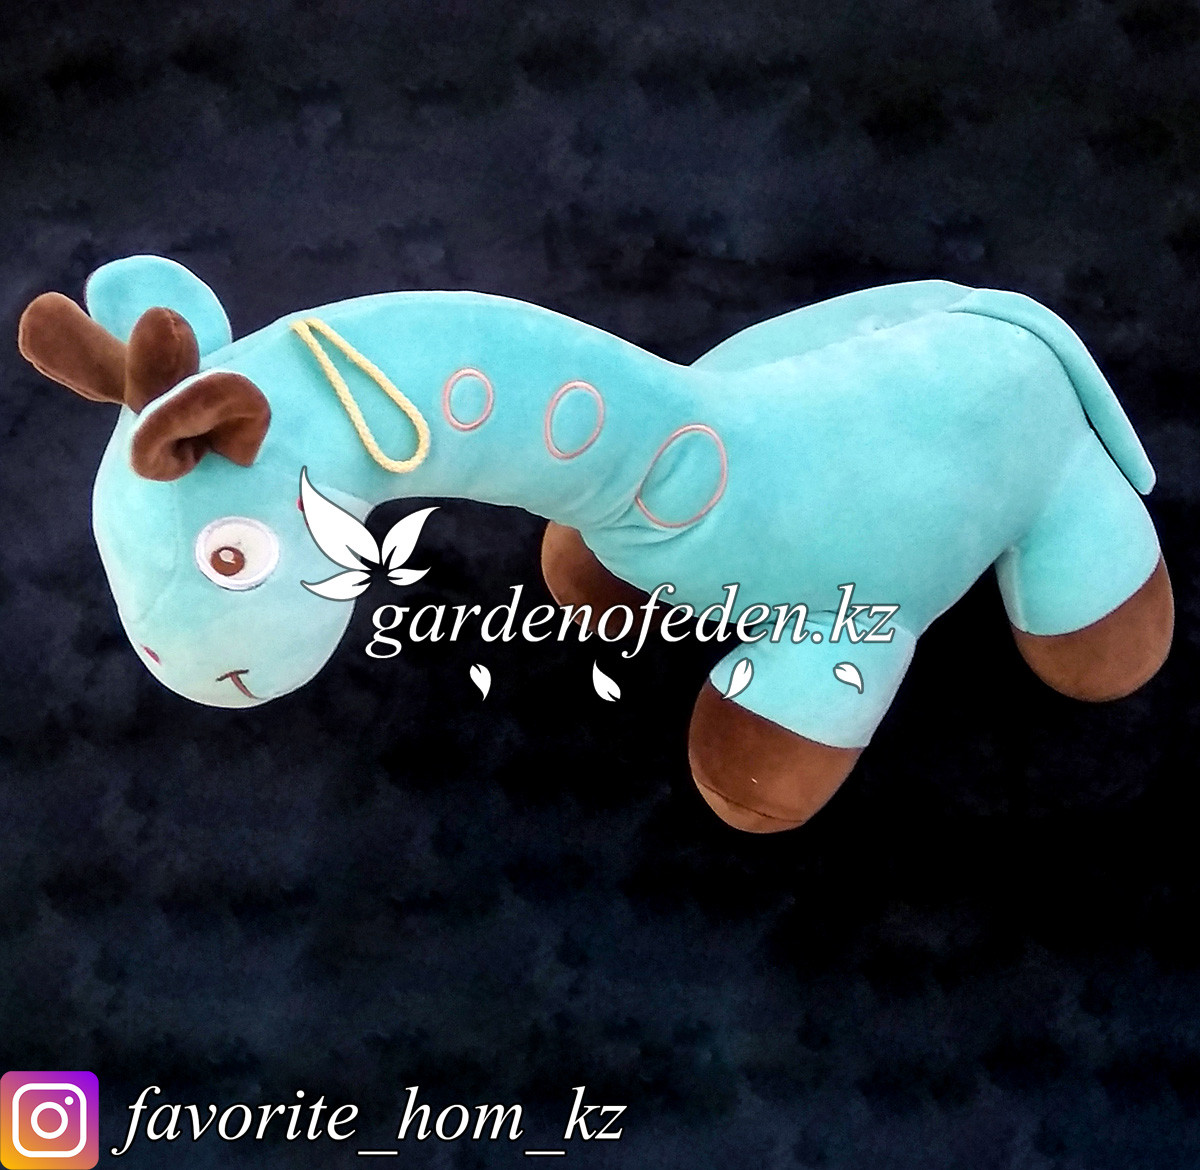 "Мягкая игрушка ""Жираф"". Цвет: Голубой. Материал: Бархат/Плюш."